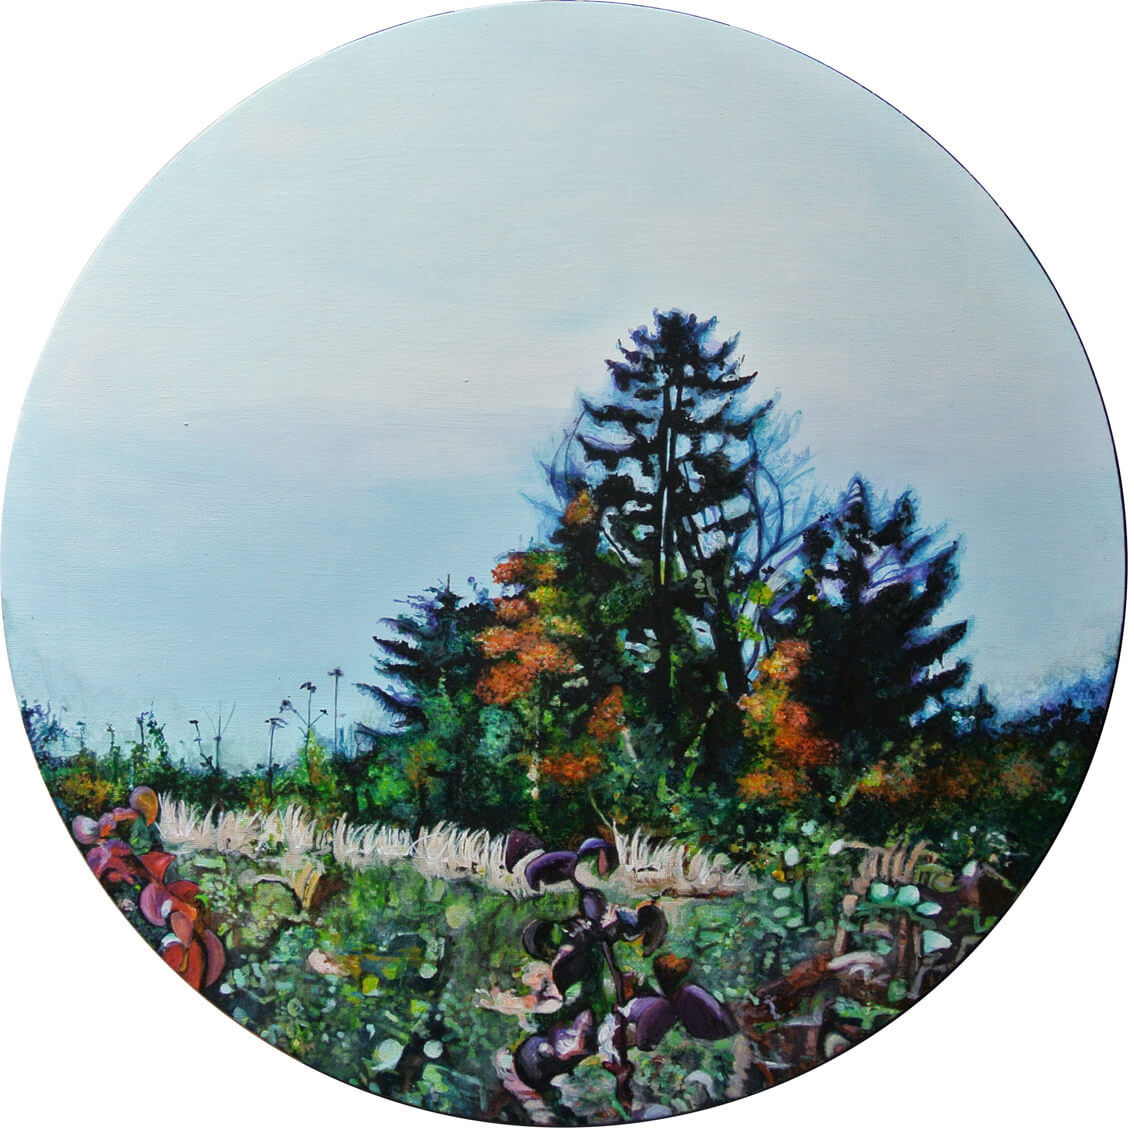 Falkenberg 2, Wuppertal– Focus on Landscape, Durchm. 50 cm, 2014, © Latzke, 850 Euro.